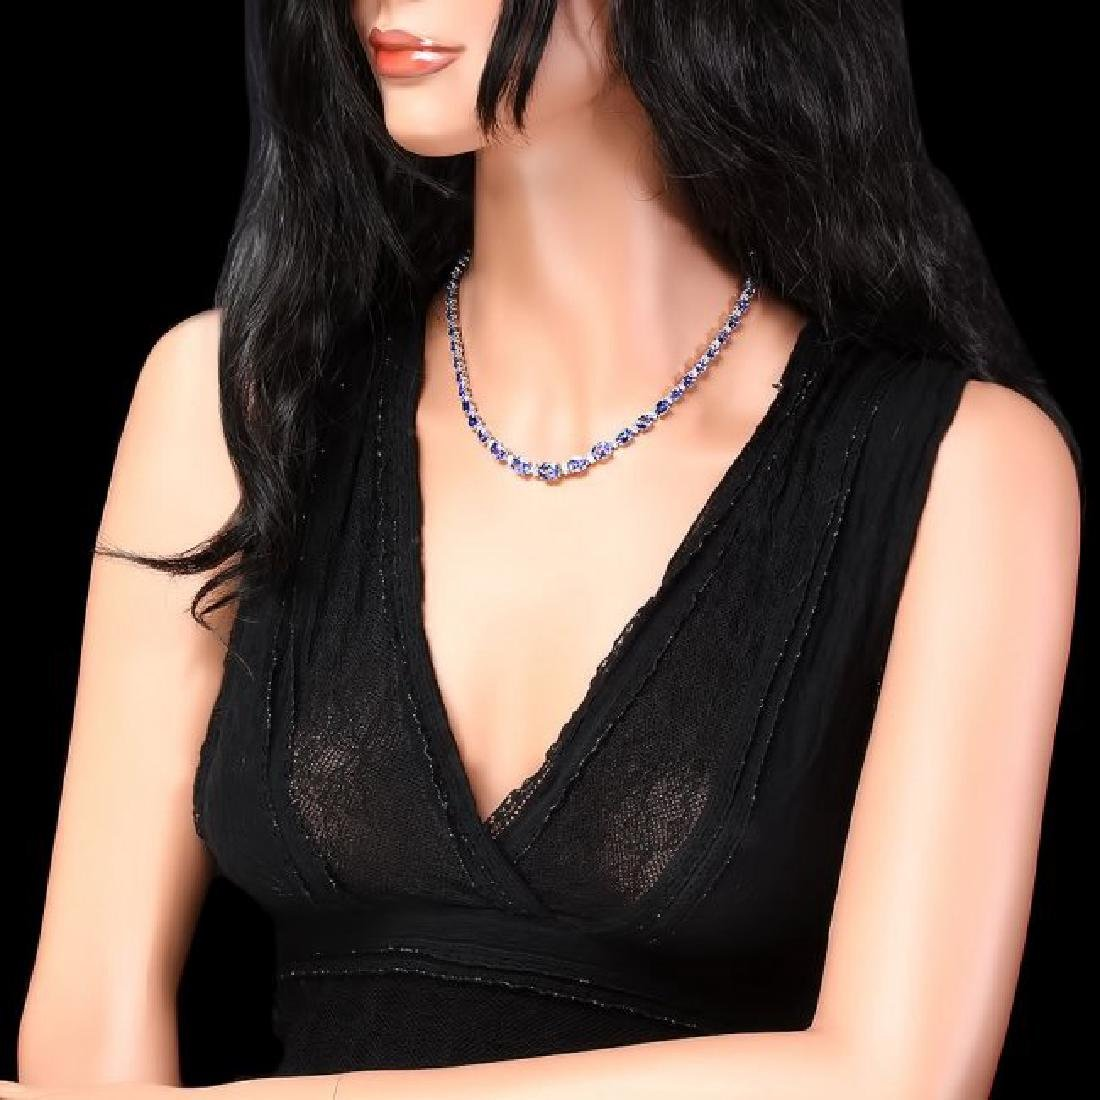 14k 26.00ct Tanzanite 1.10ct Diamond Necklace - 5